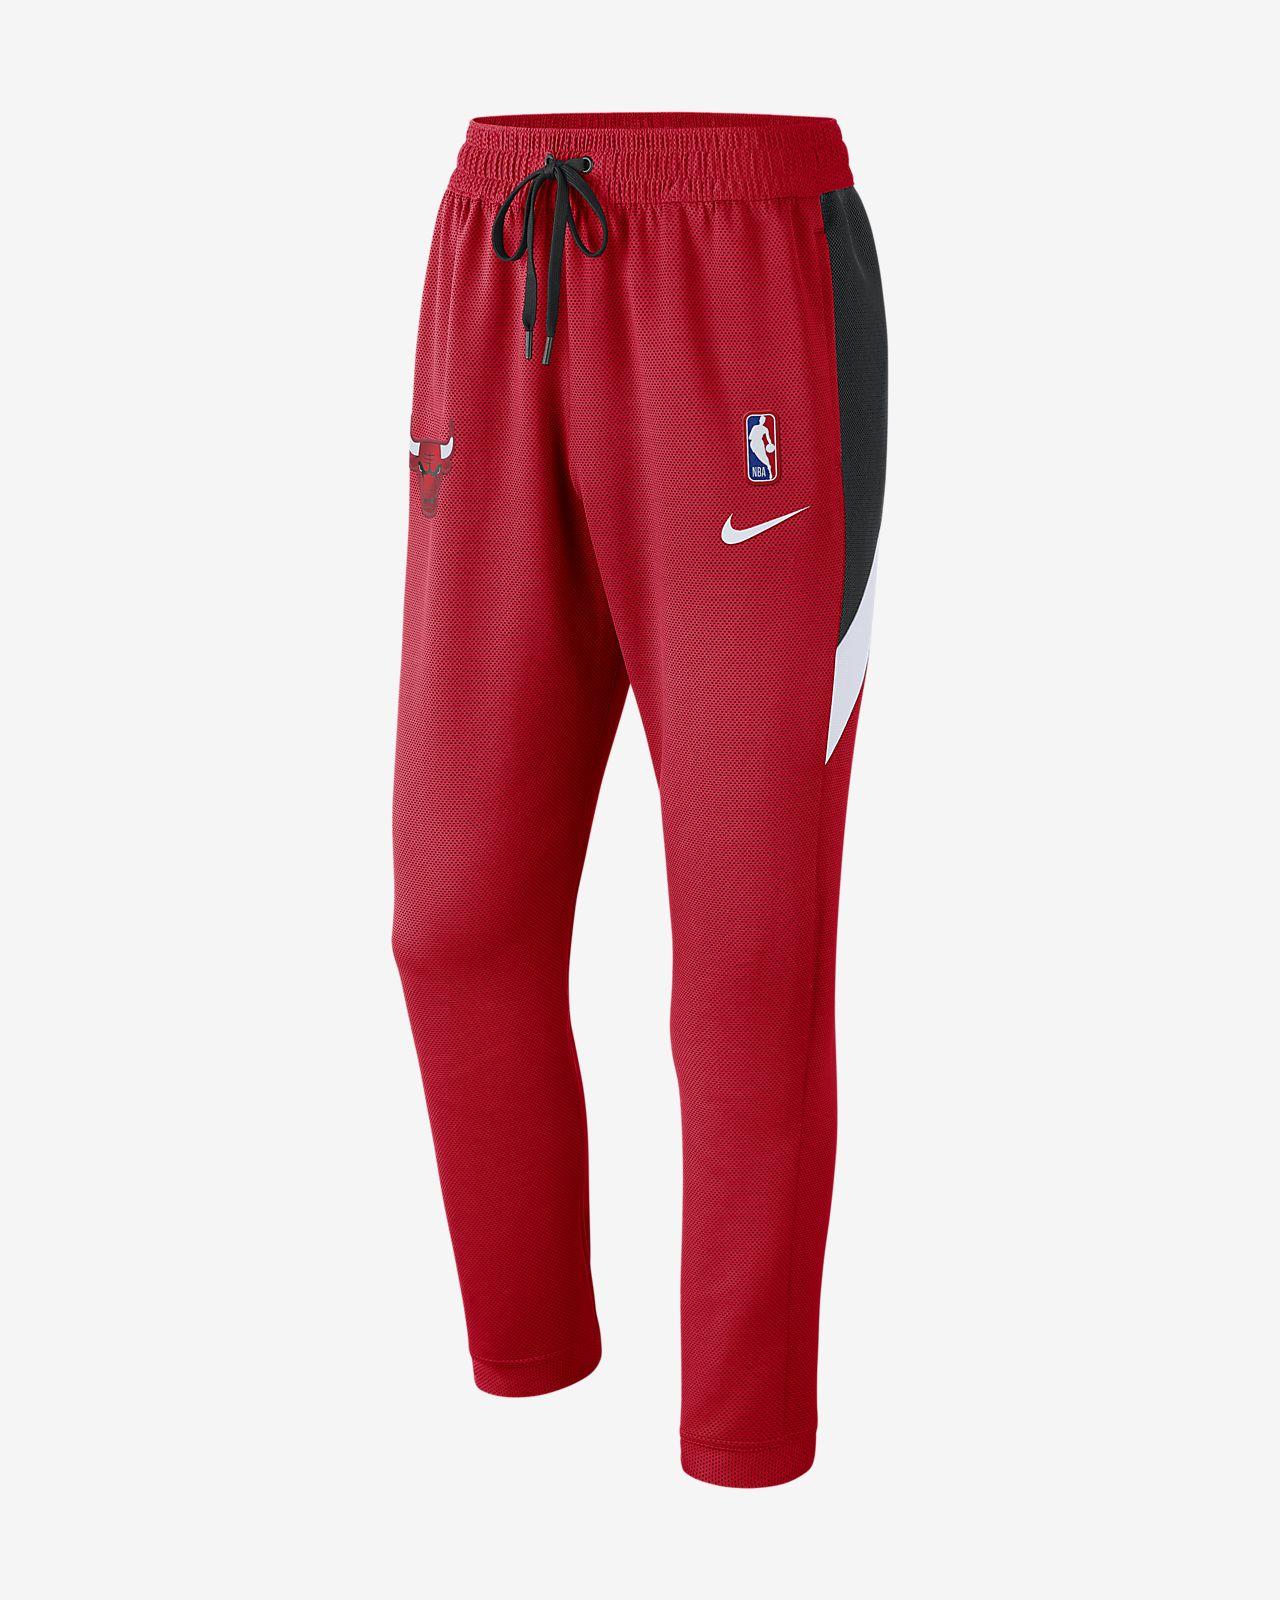 Chicago Bulls Nike Therma Flex Showtime NBA Erkek Eşofman Altı